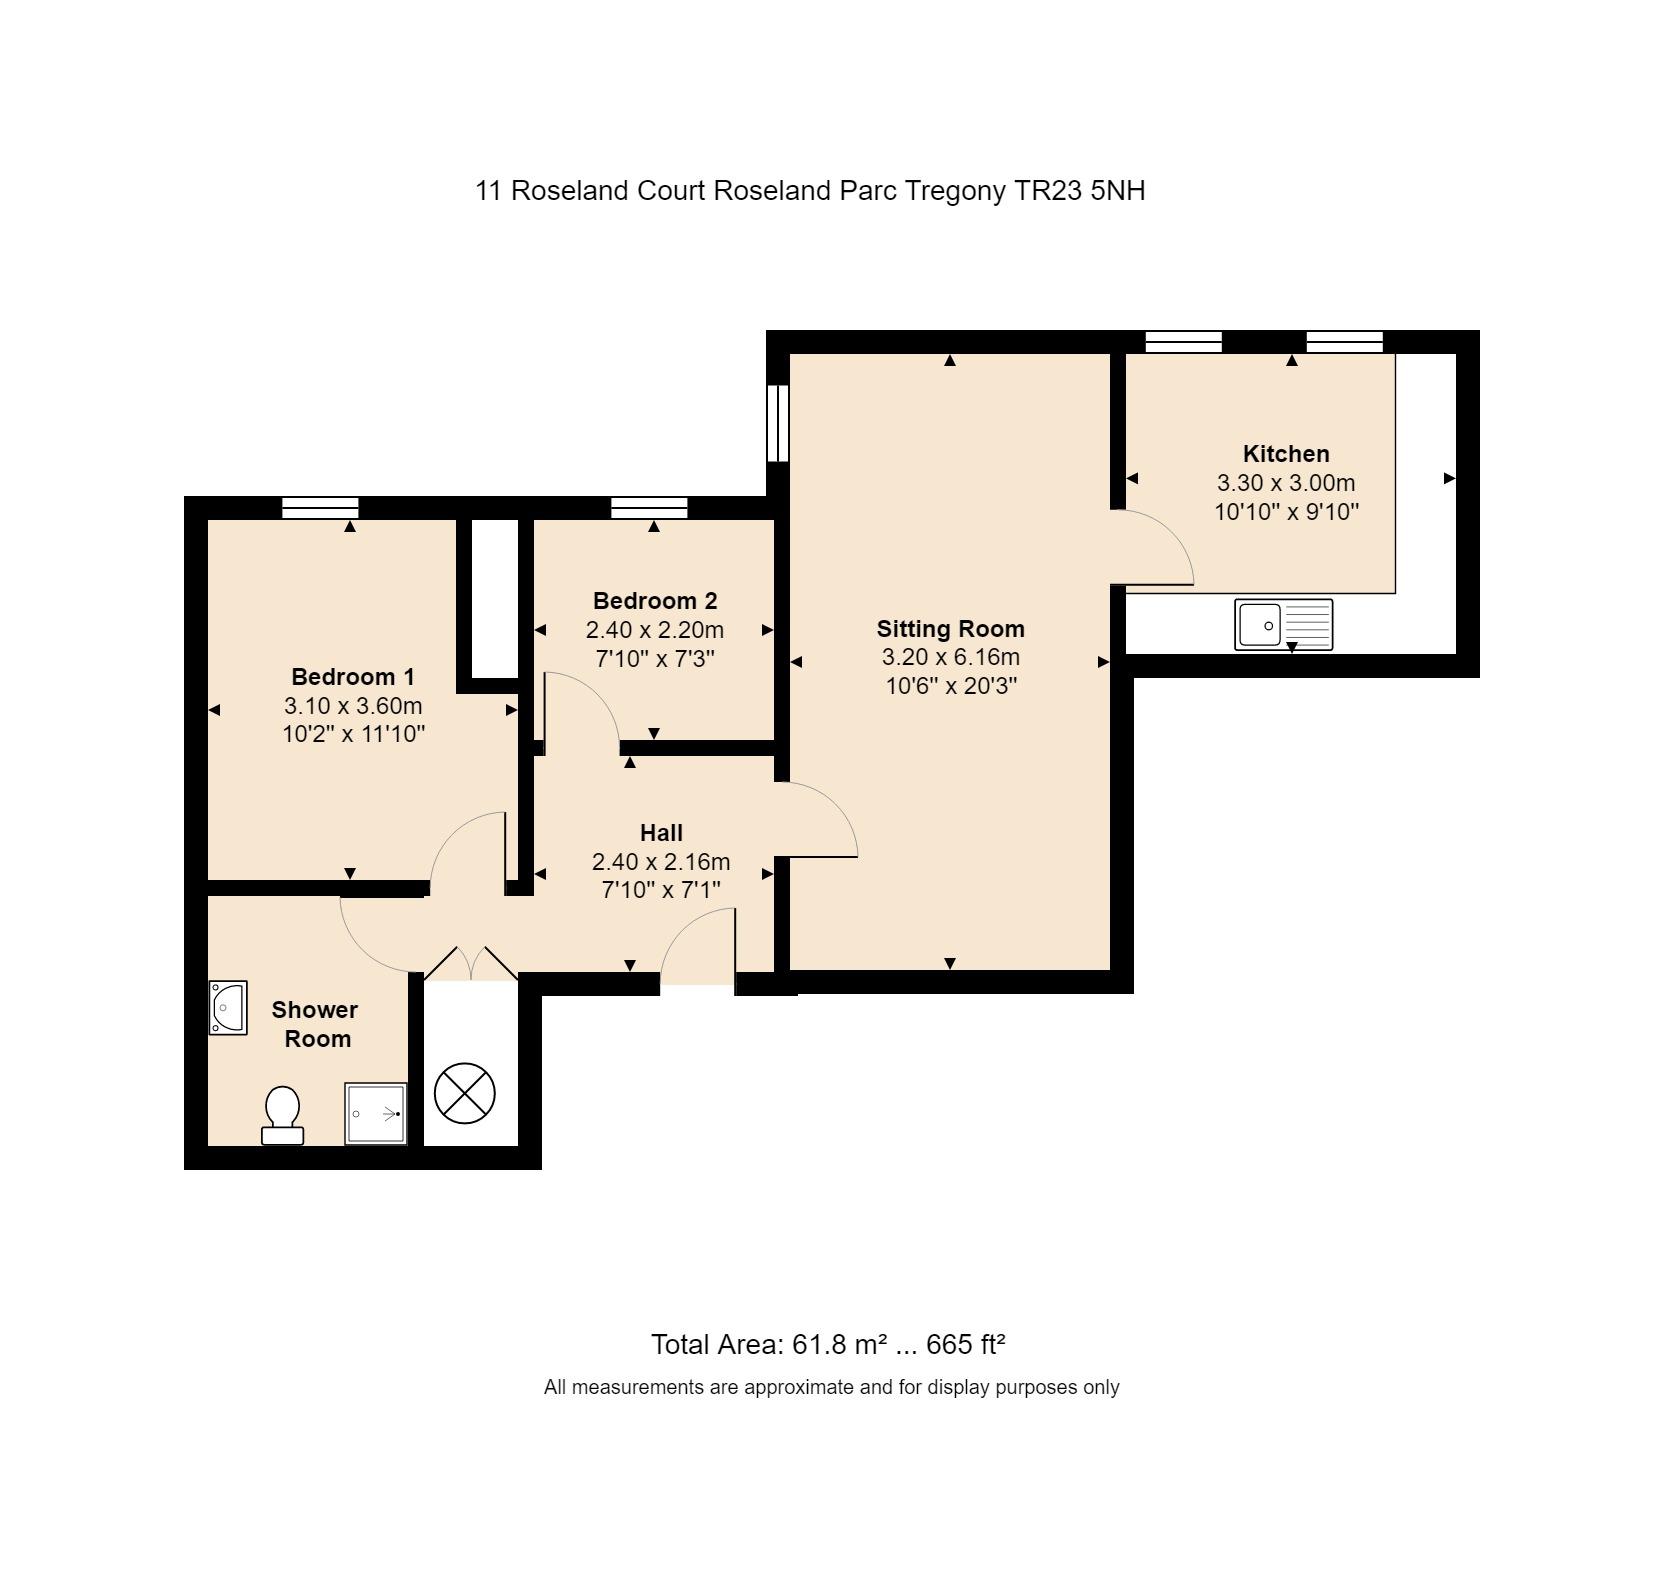 11 Roseland Court Floorplan